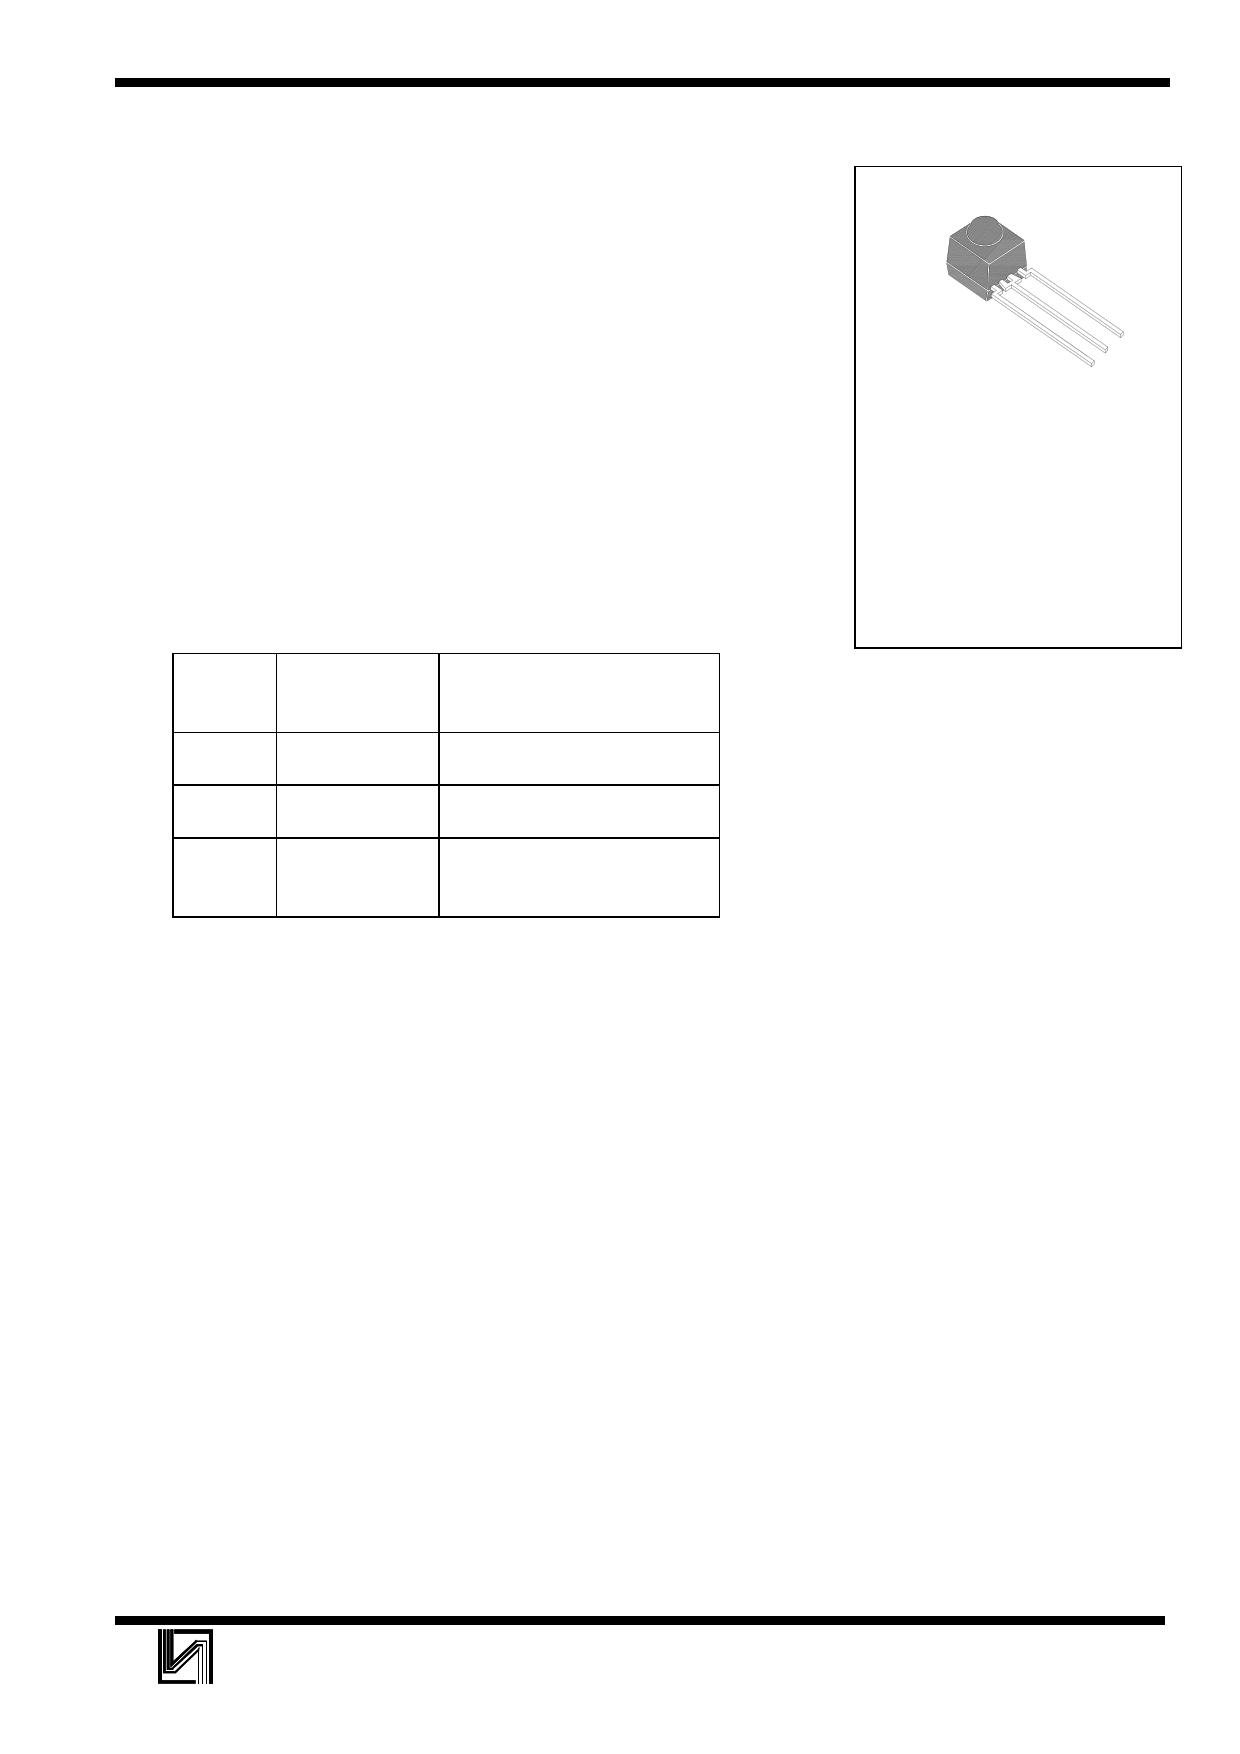 ILOP1836SS Datasheet, ILOP1836SS PDF,ピン配置, 機能